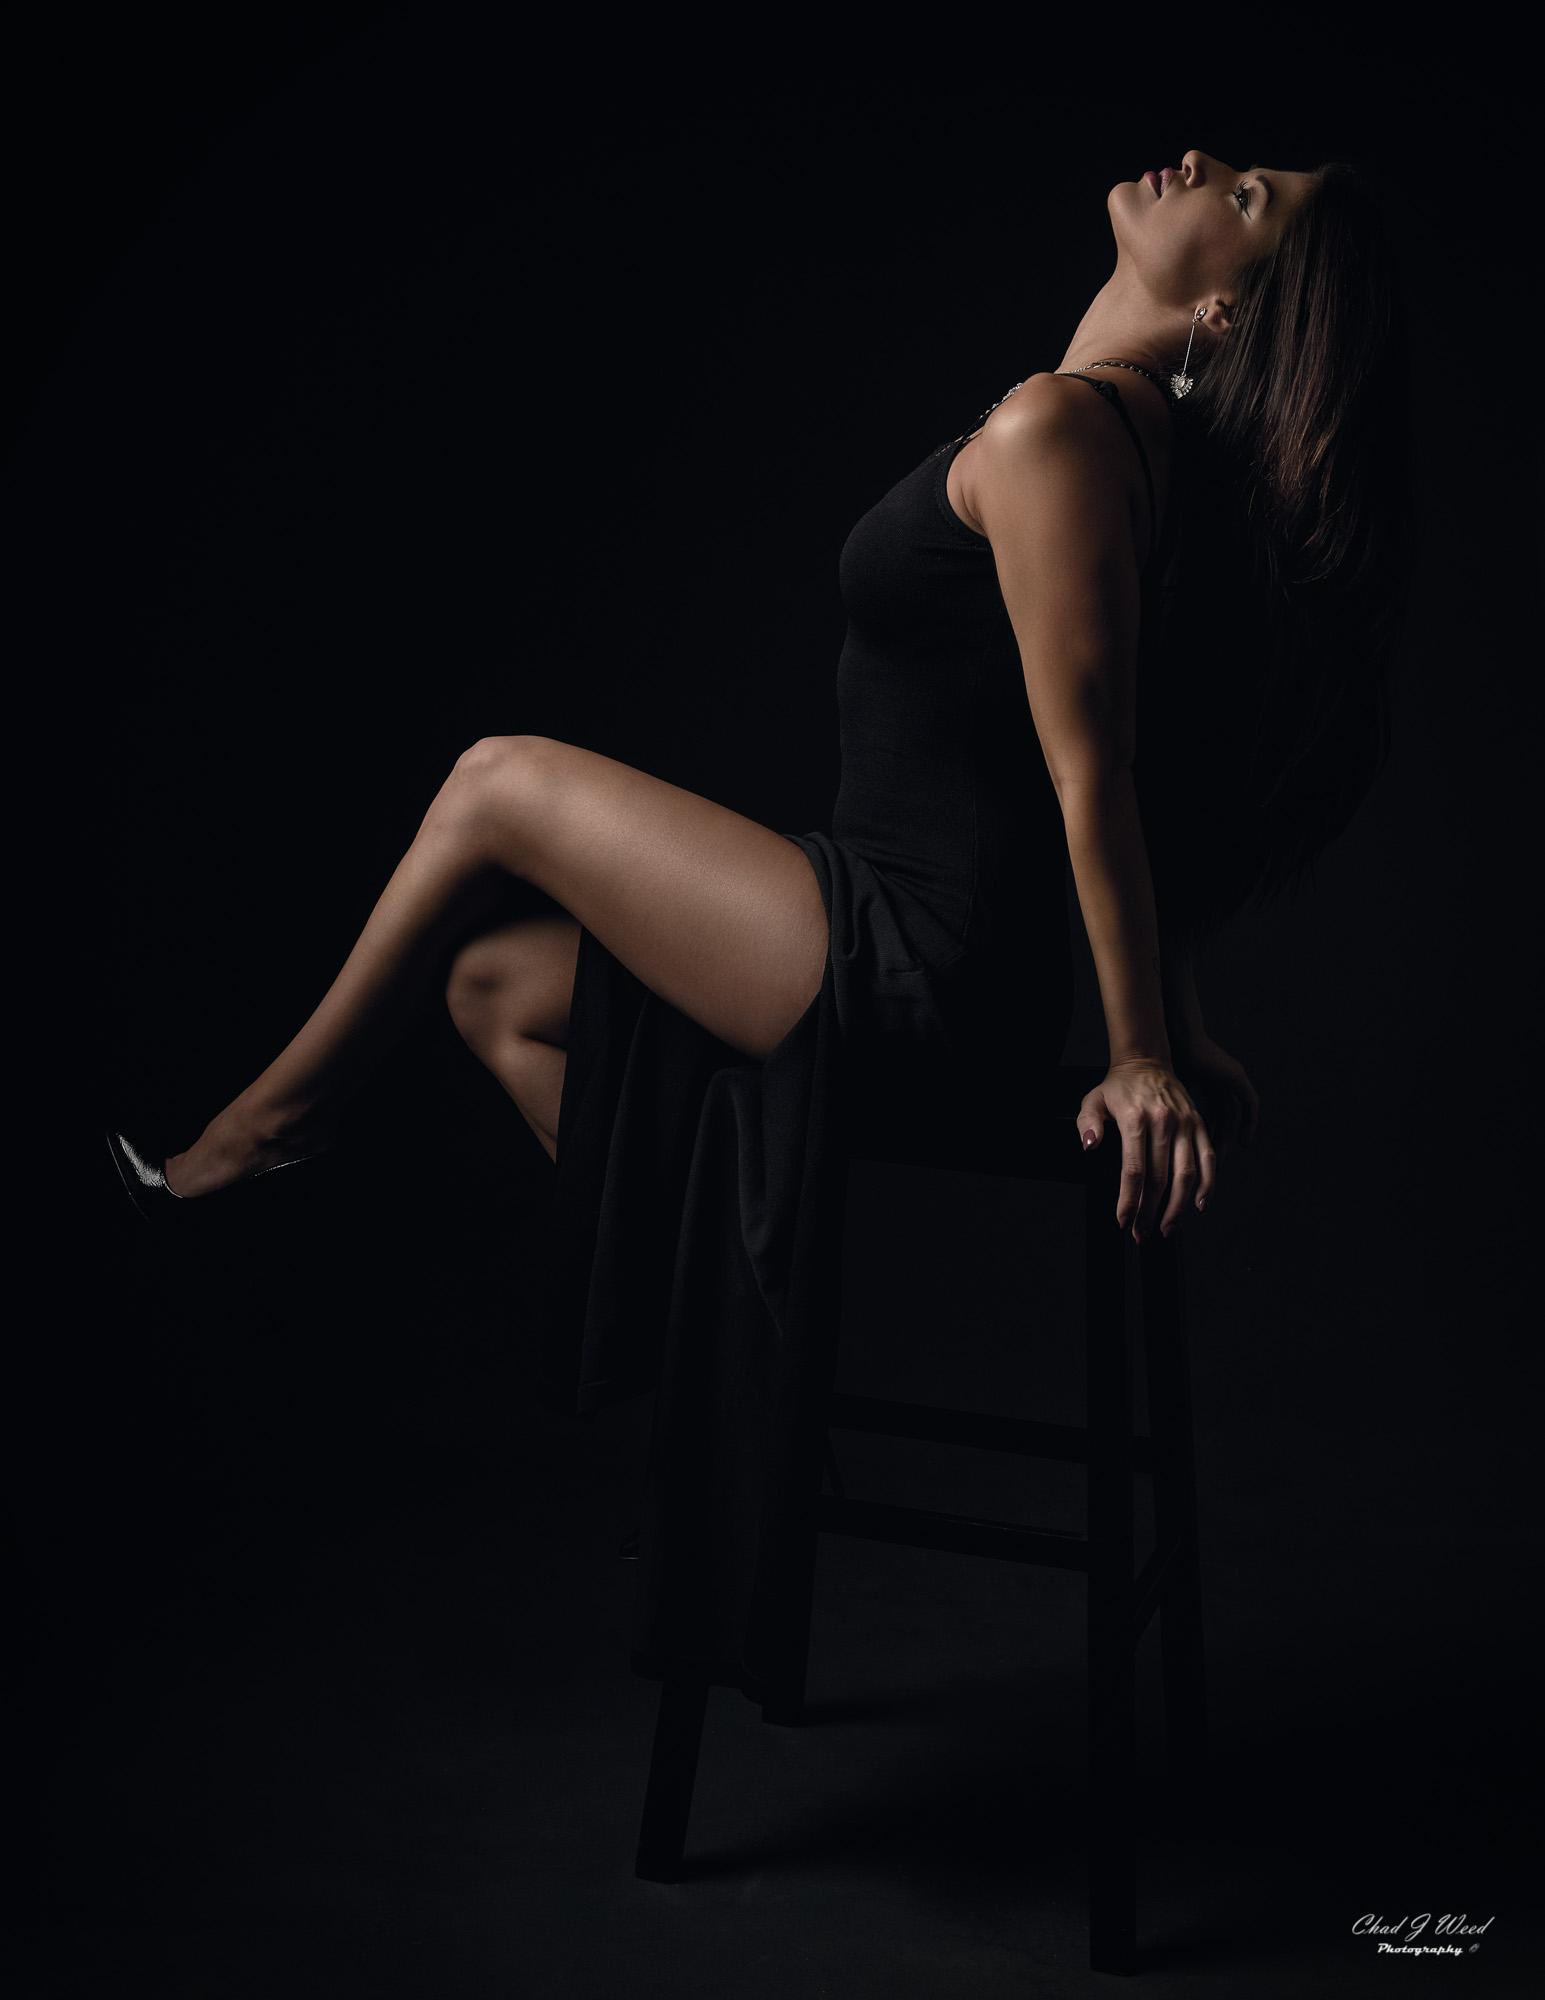 Arizona Fashion Photographer Chad Weed with Fitness Model Ashly - Black Dress 3